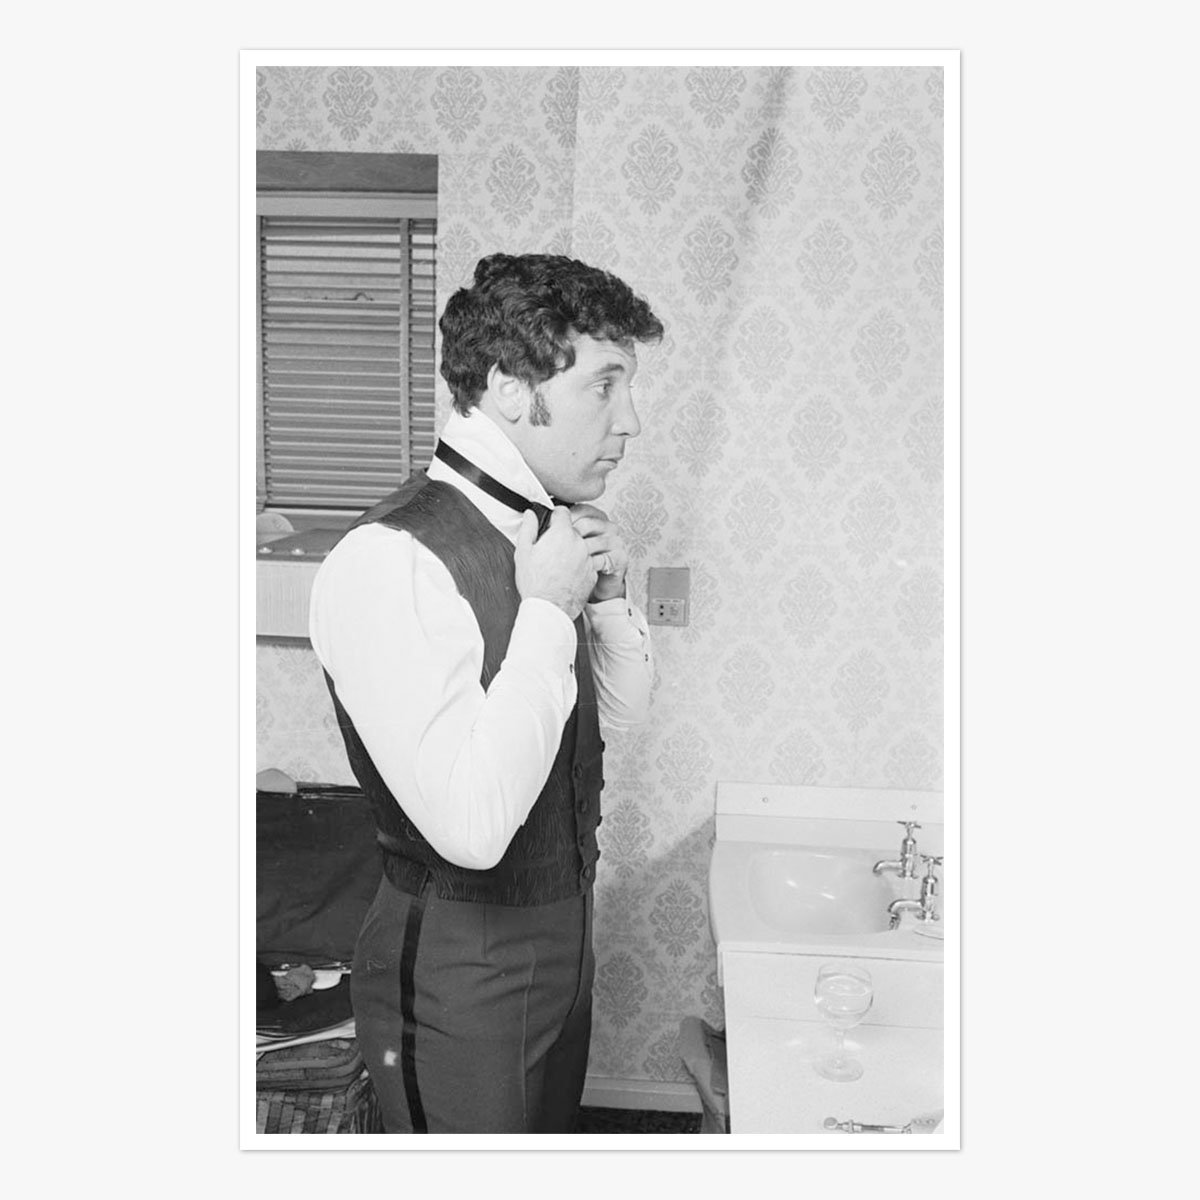 Singer Tom Jones by Ian Tyas